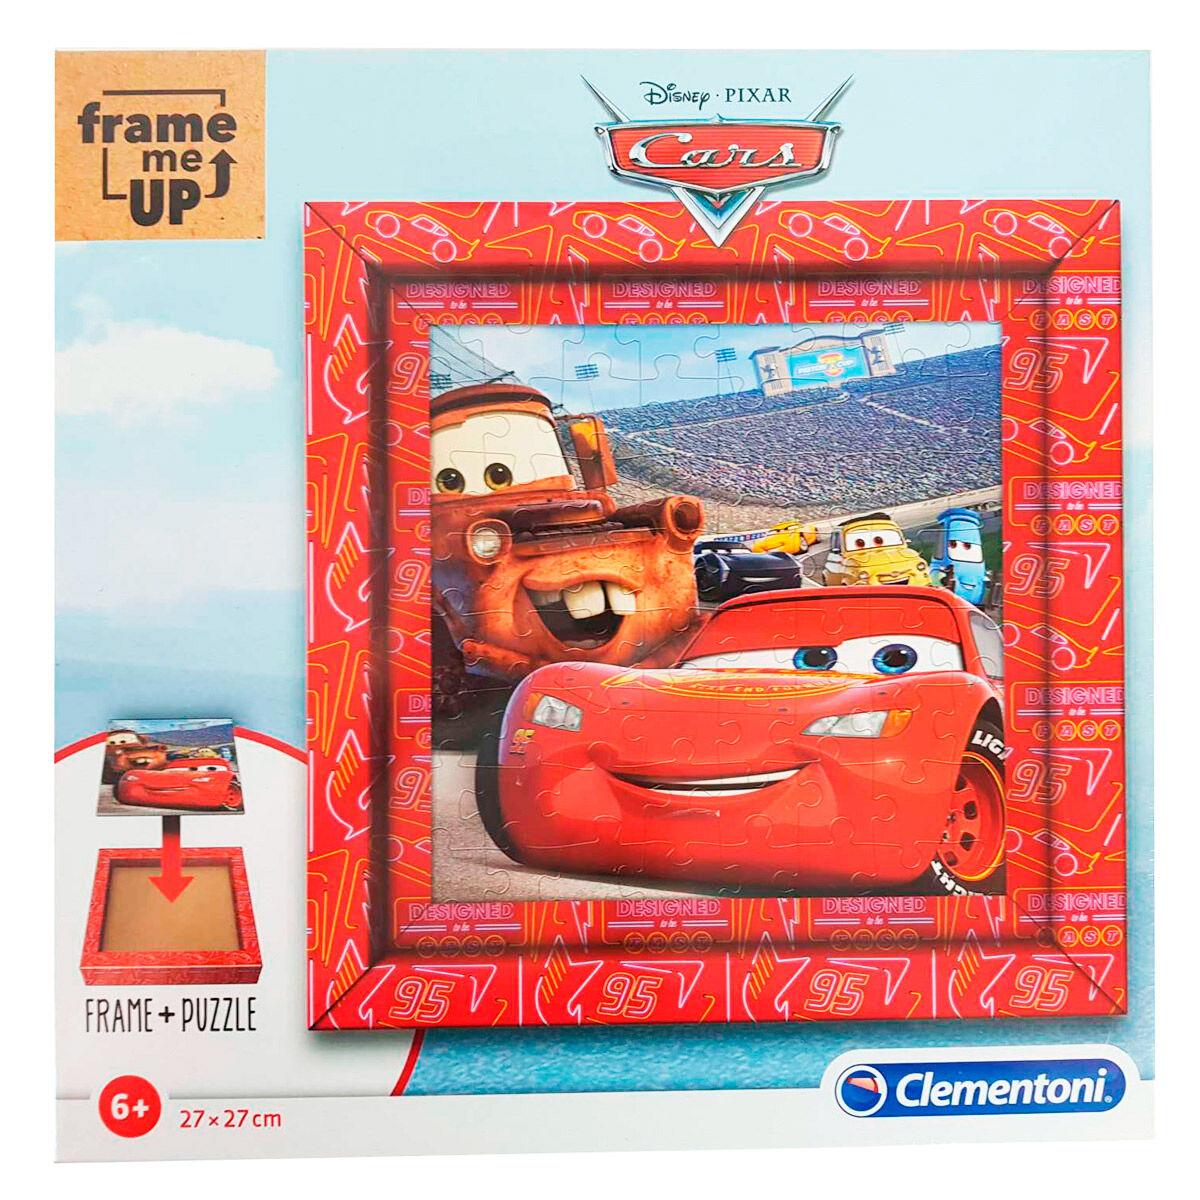 Disney Cars Frame Me Up puzzle 60pcs